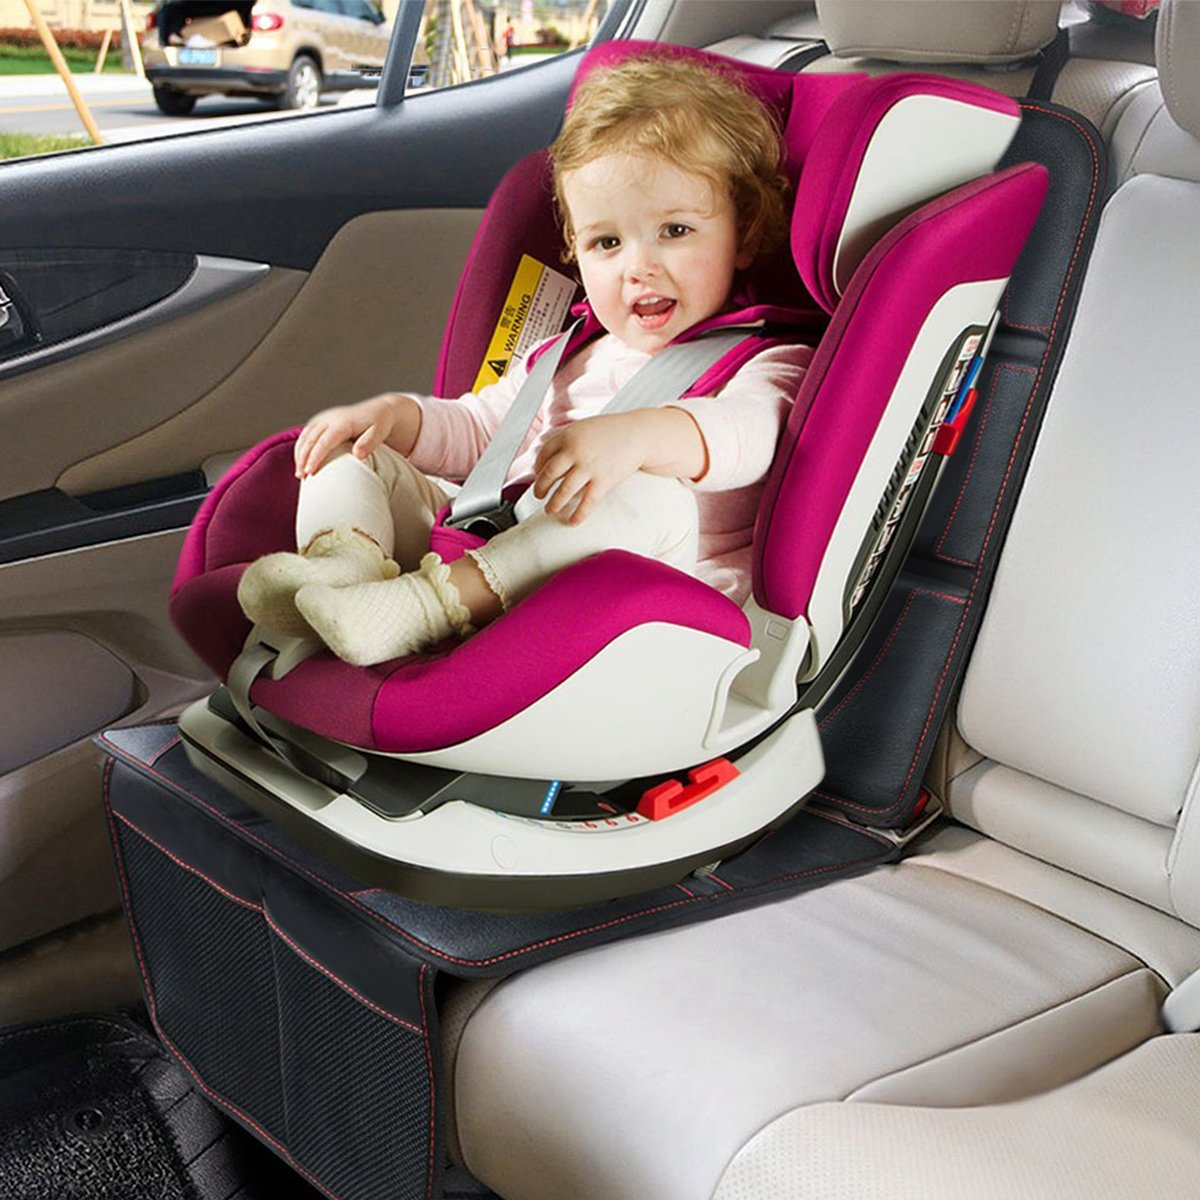 Protector antideslizante para asientos de coche Con bolsillos organizadores GLAMSVILL Tama/ño universal para asientos de coche y de beb/és o ni/ños 2 Pack